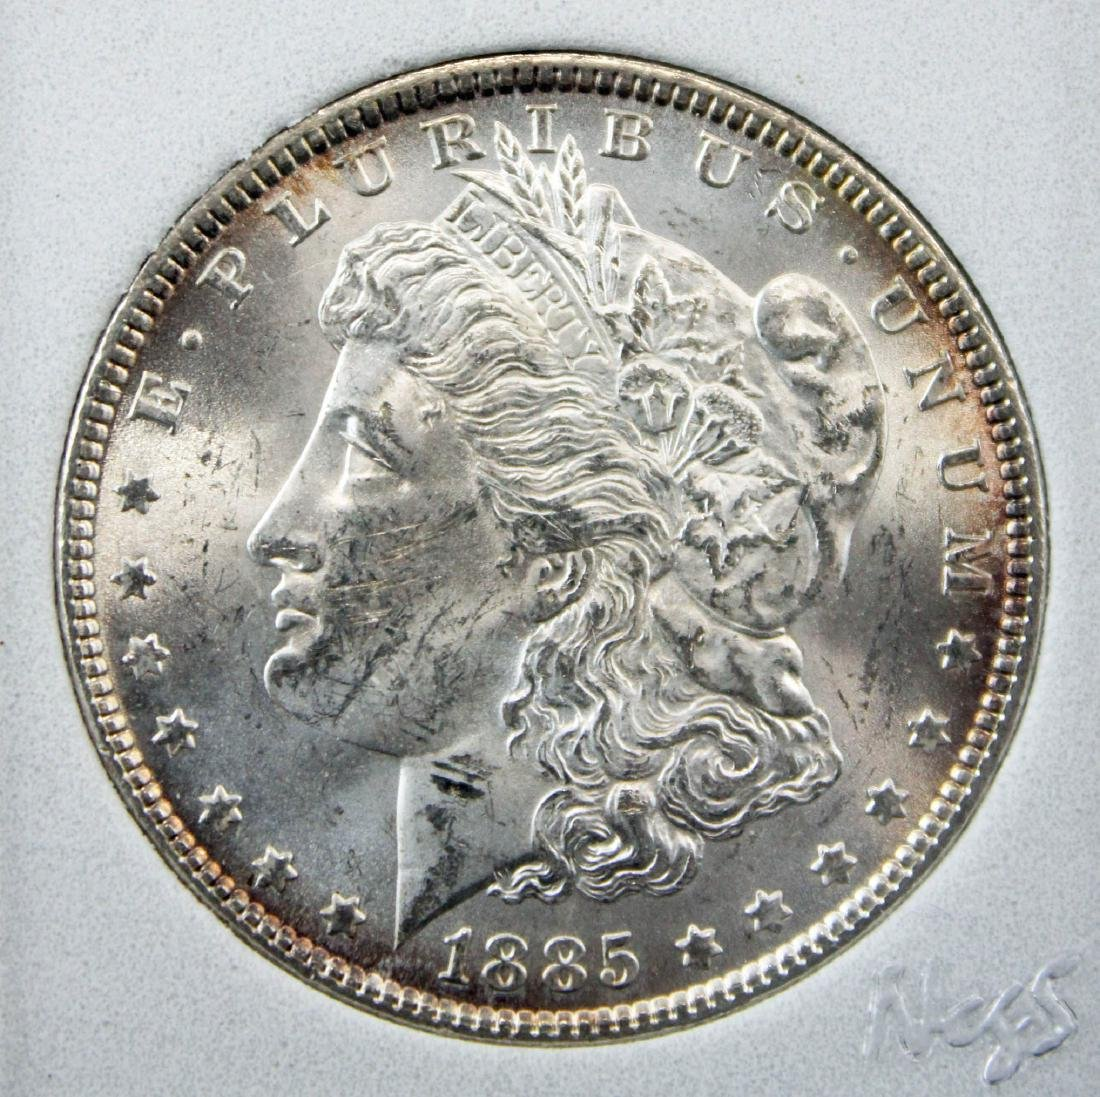 2 Morgan Silver Dollars 1878 S AU58 & 1885 P MS63 - 2